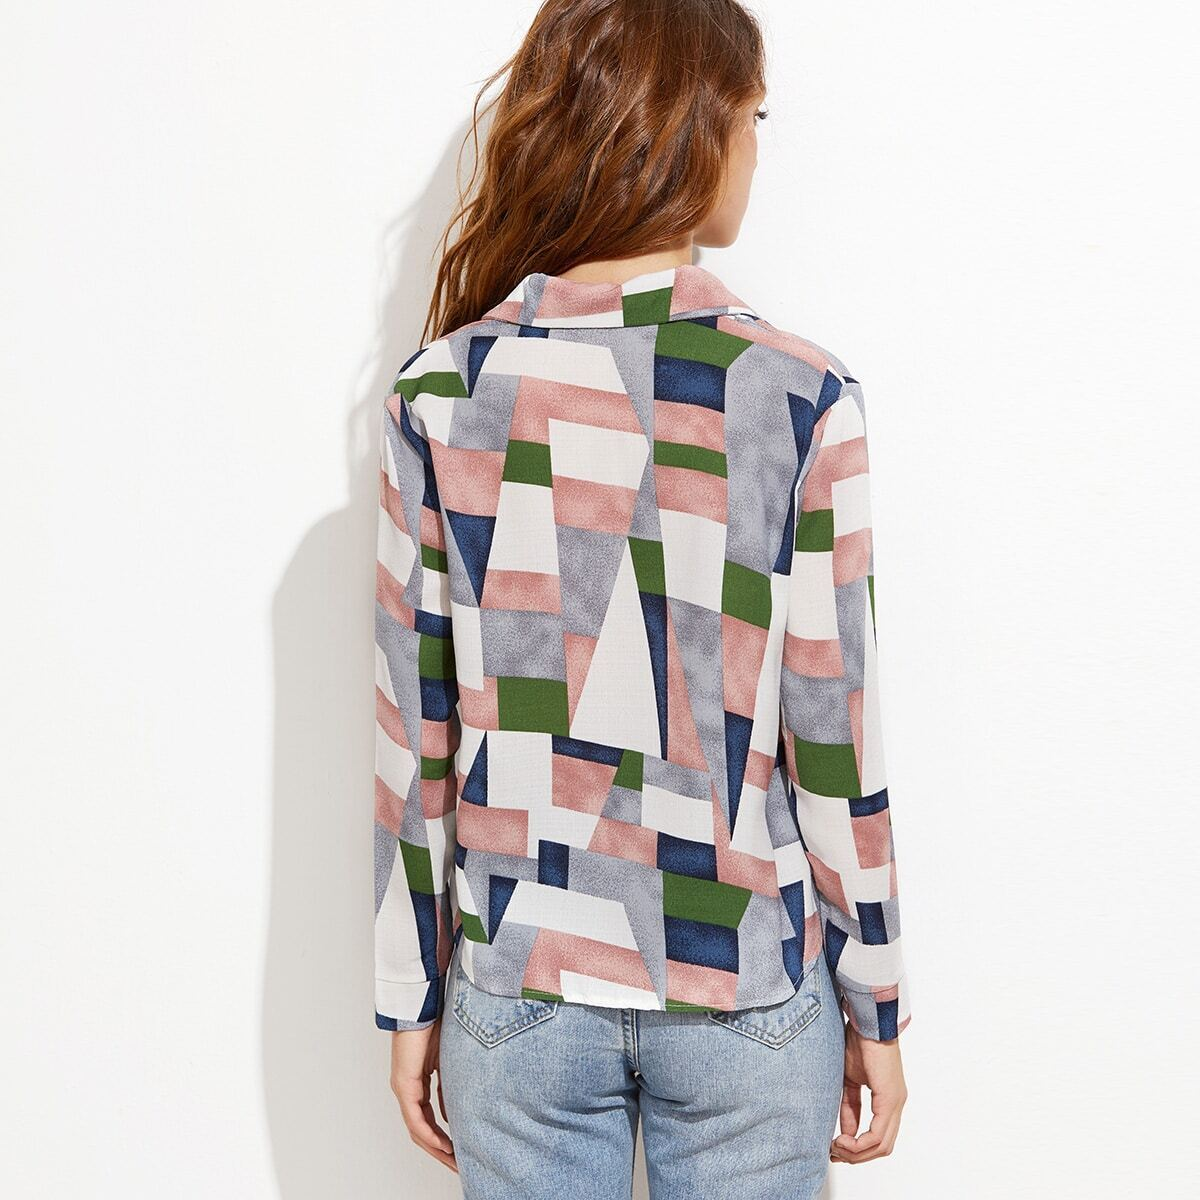 blouse160923101_3